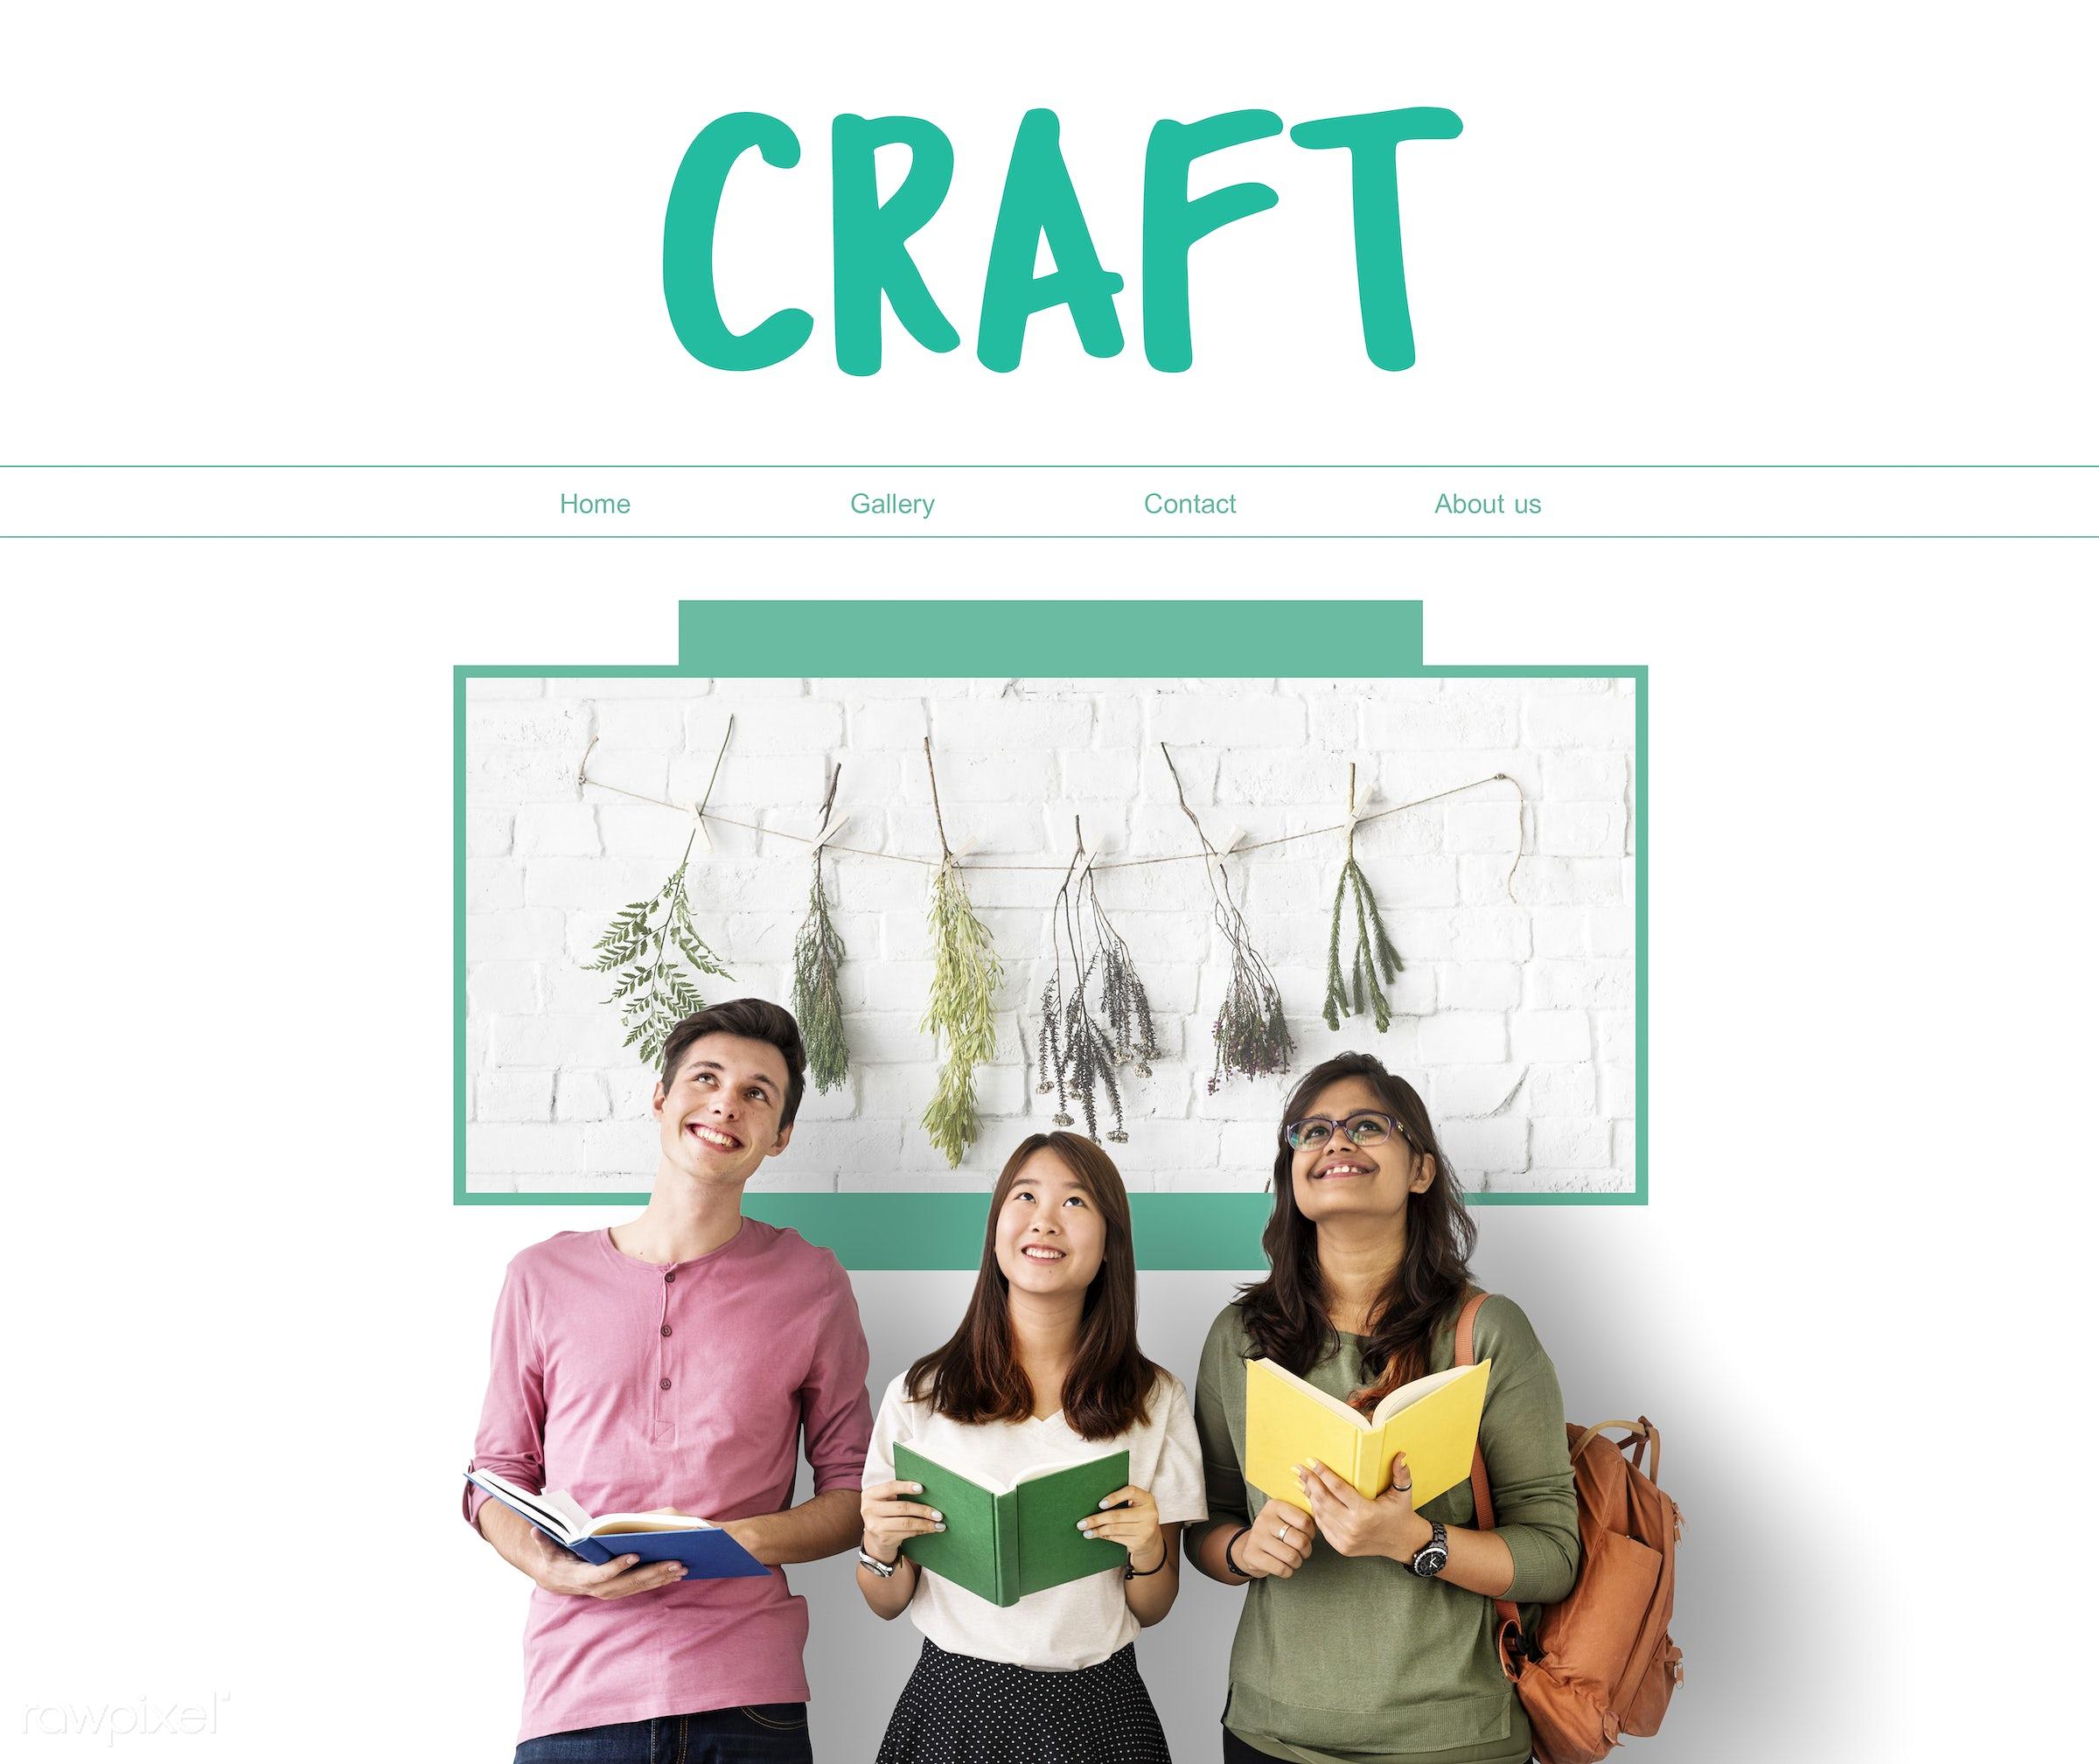 activity, african descent, art, asian, book, capability, caucasian, craft, craftsman, craftsmanship, diversity, enjoyment,...